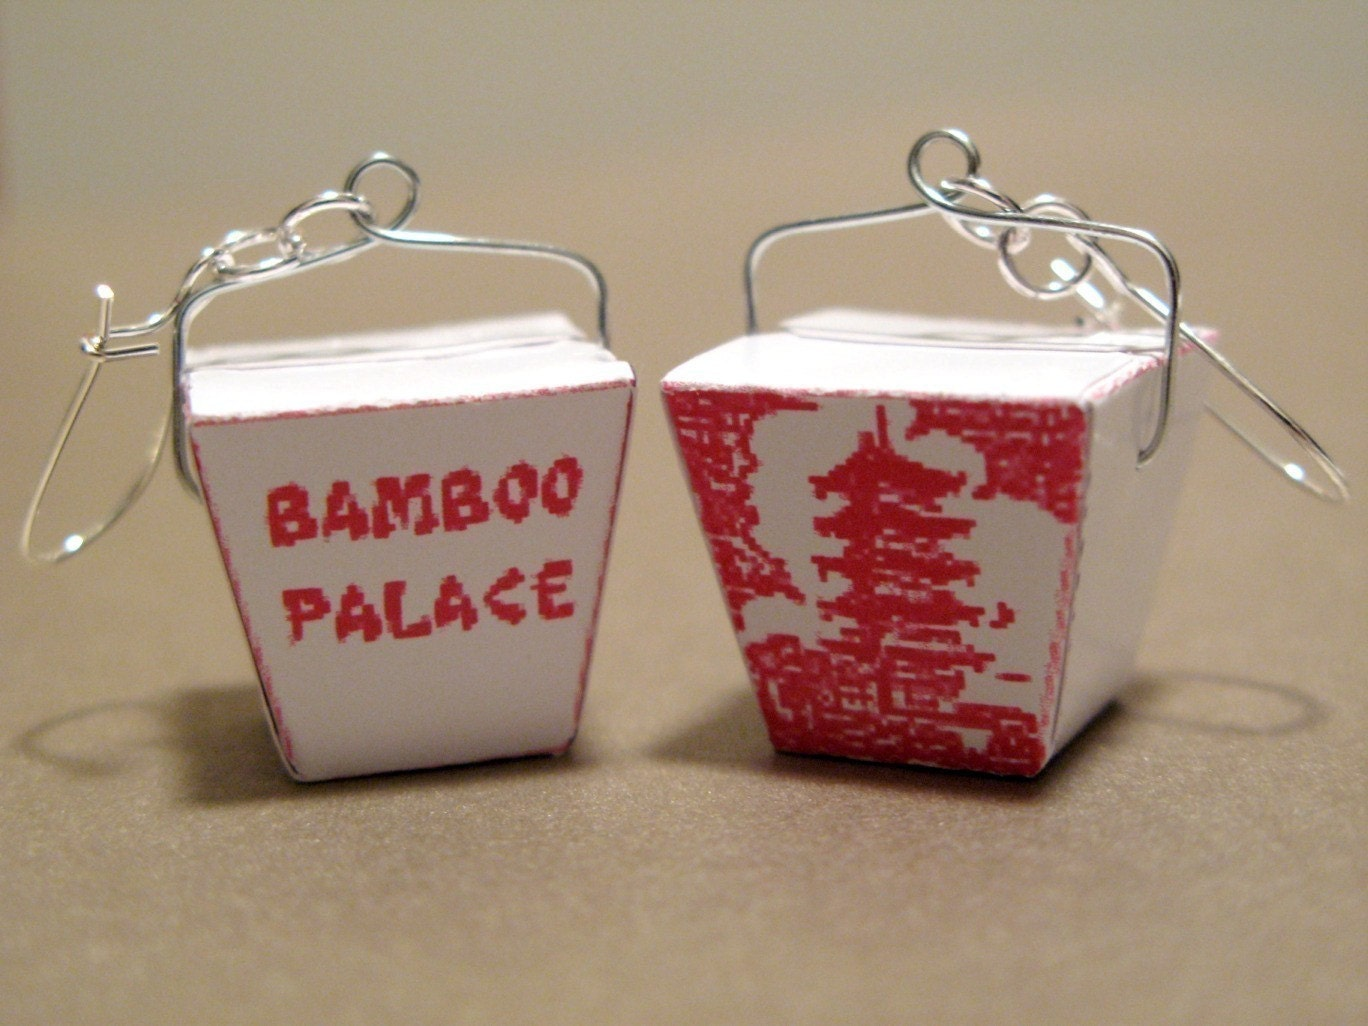 Mini Chinese Take Out Box Earrings